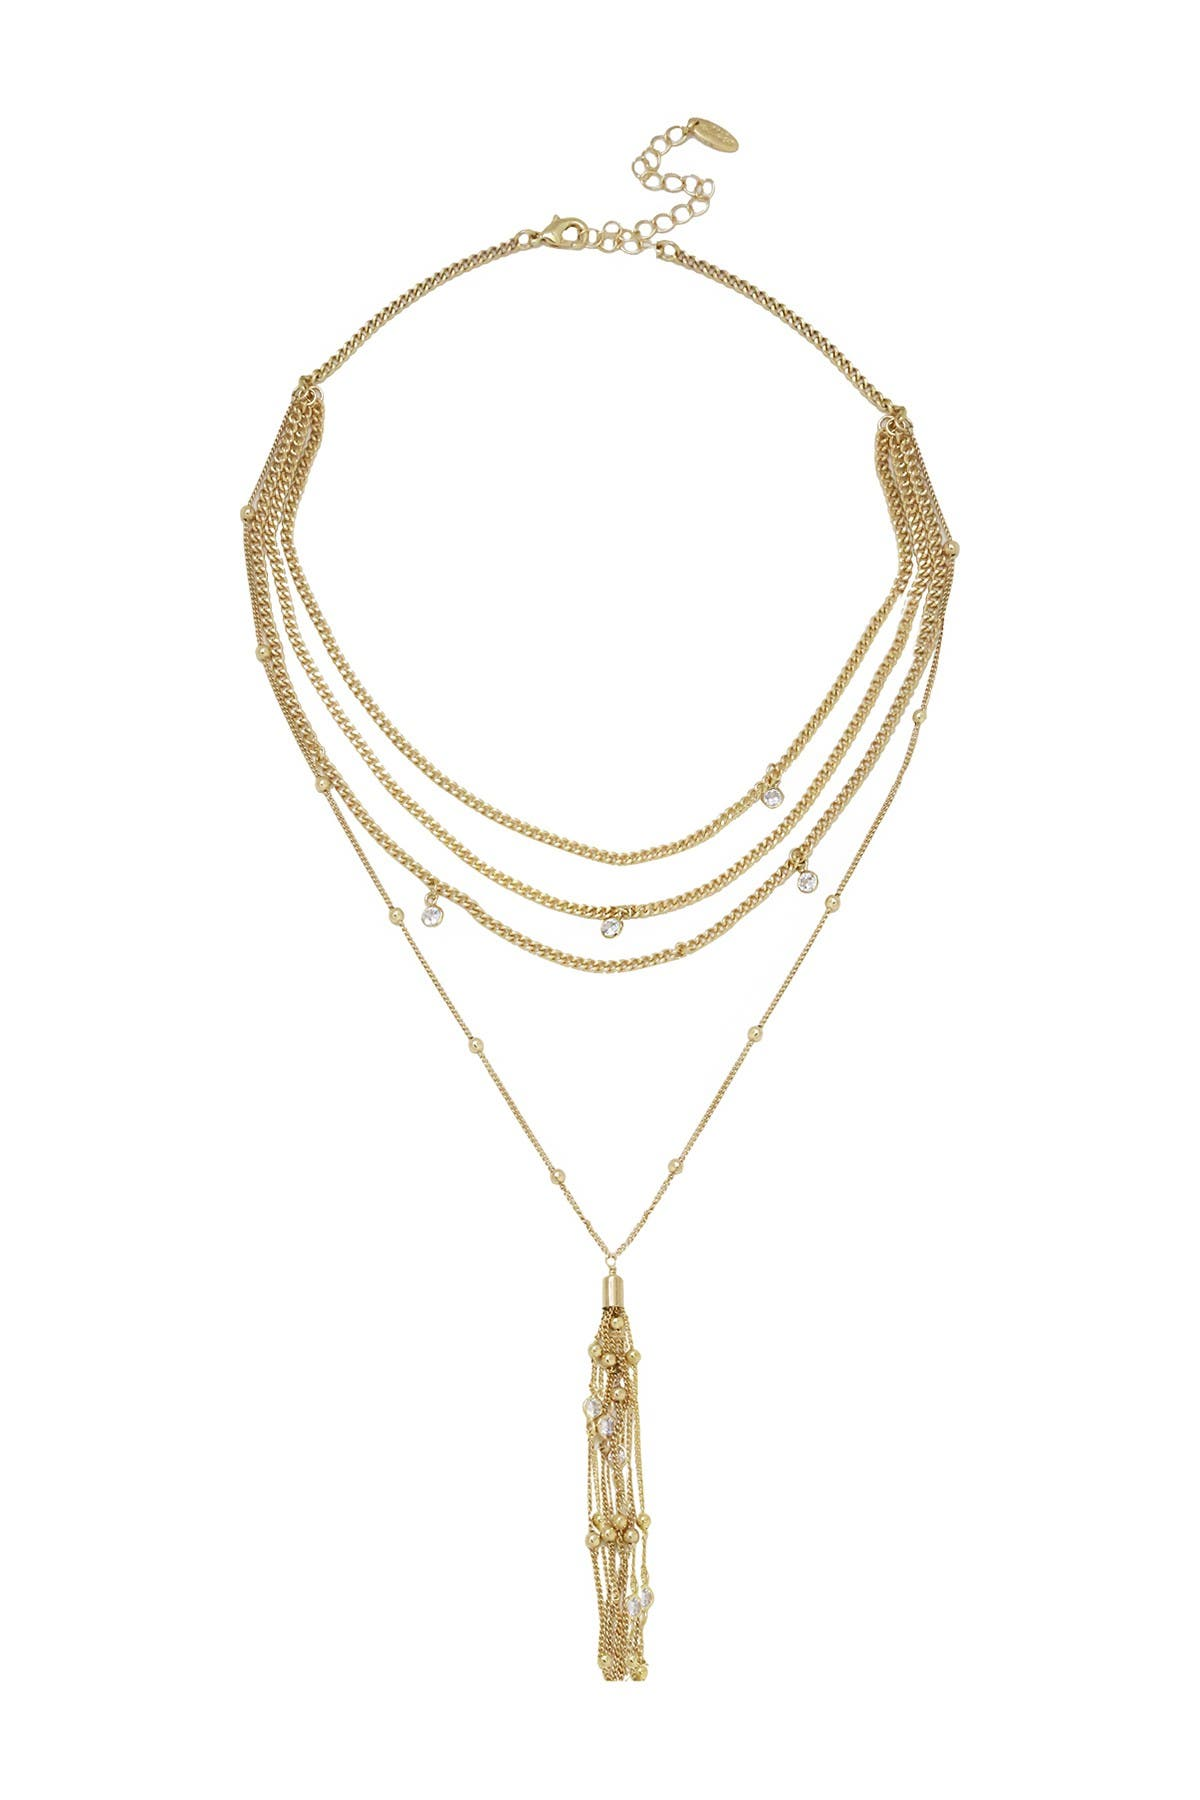 Image of Ettika 18K Gold Plated CZ Multi Chain Tassel Pendant Necklace